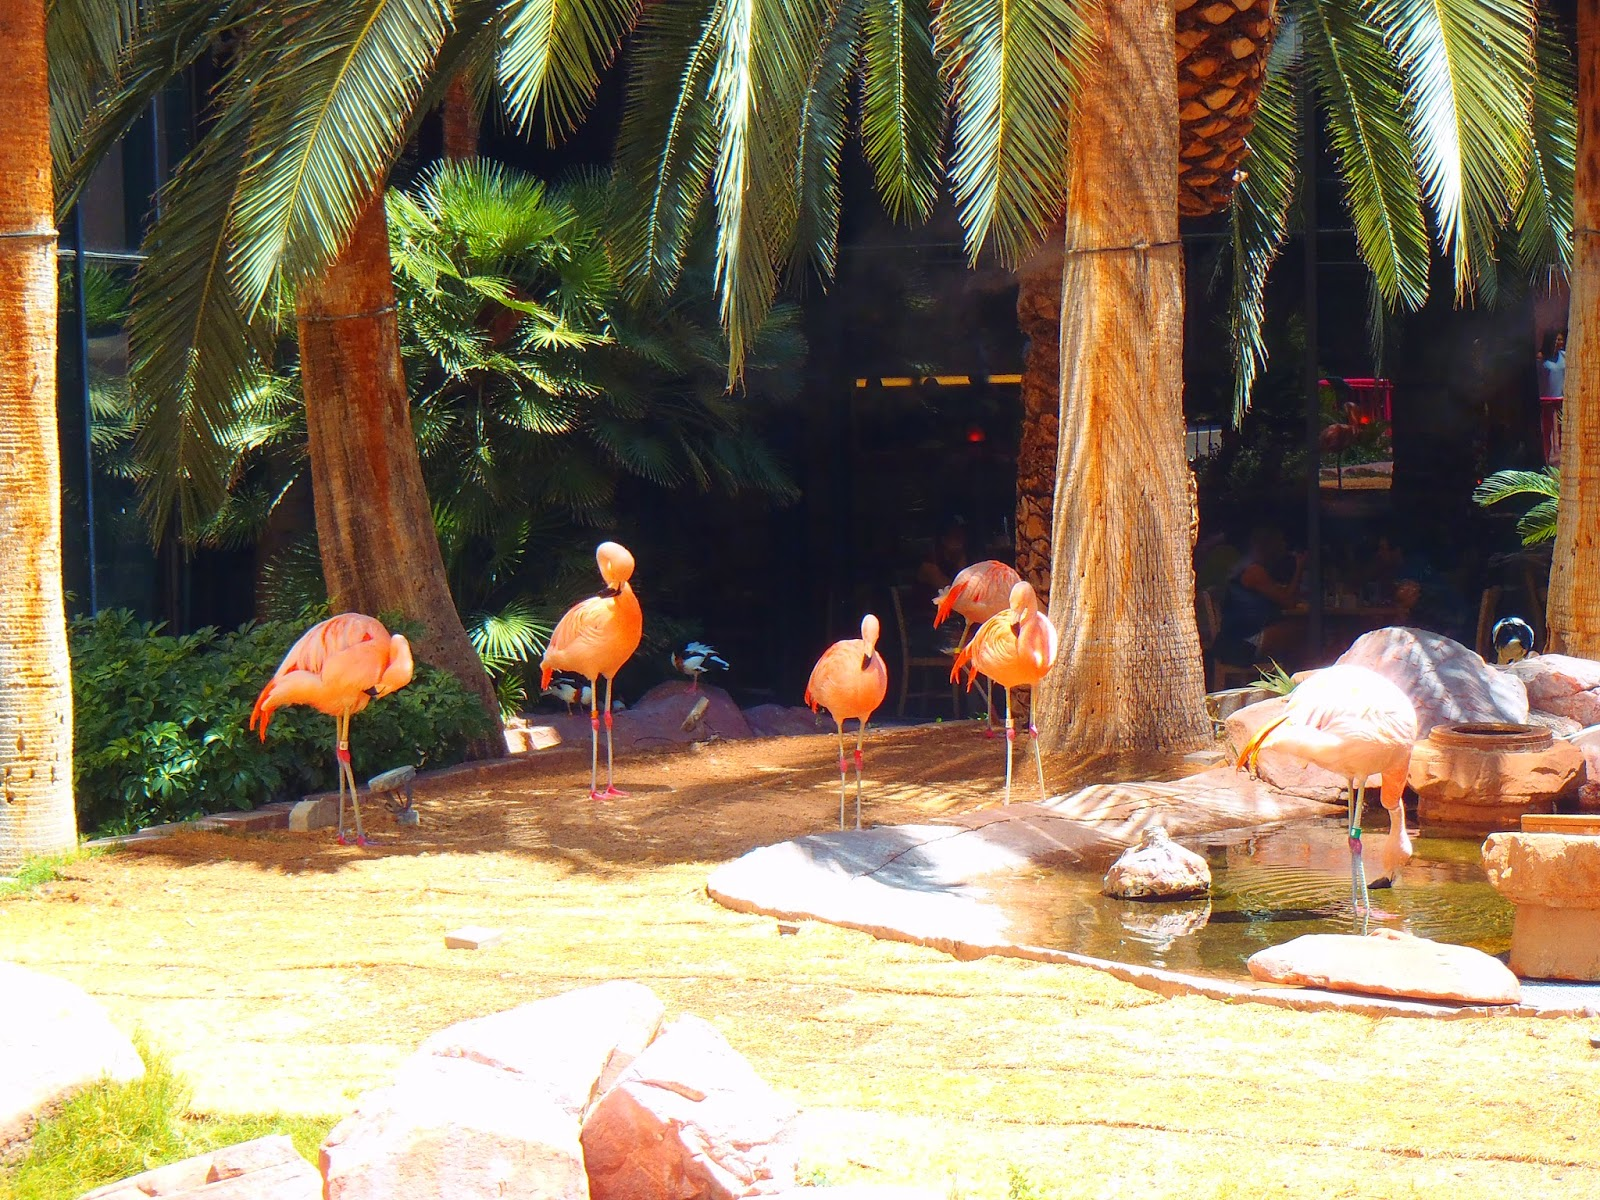 flamingos at the flamingo hotel and casino